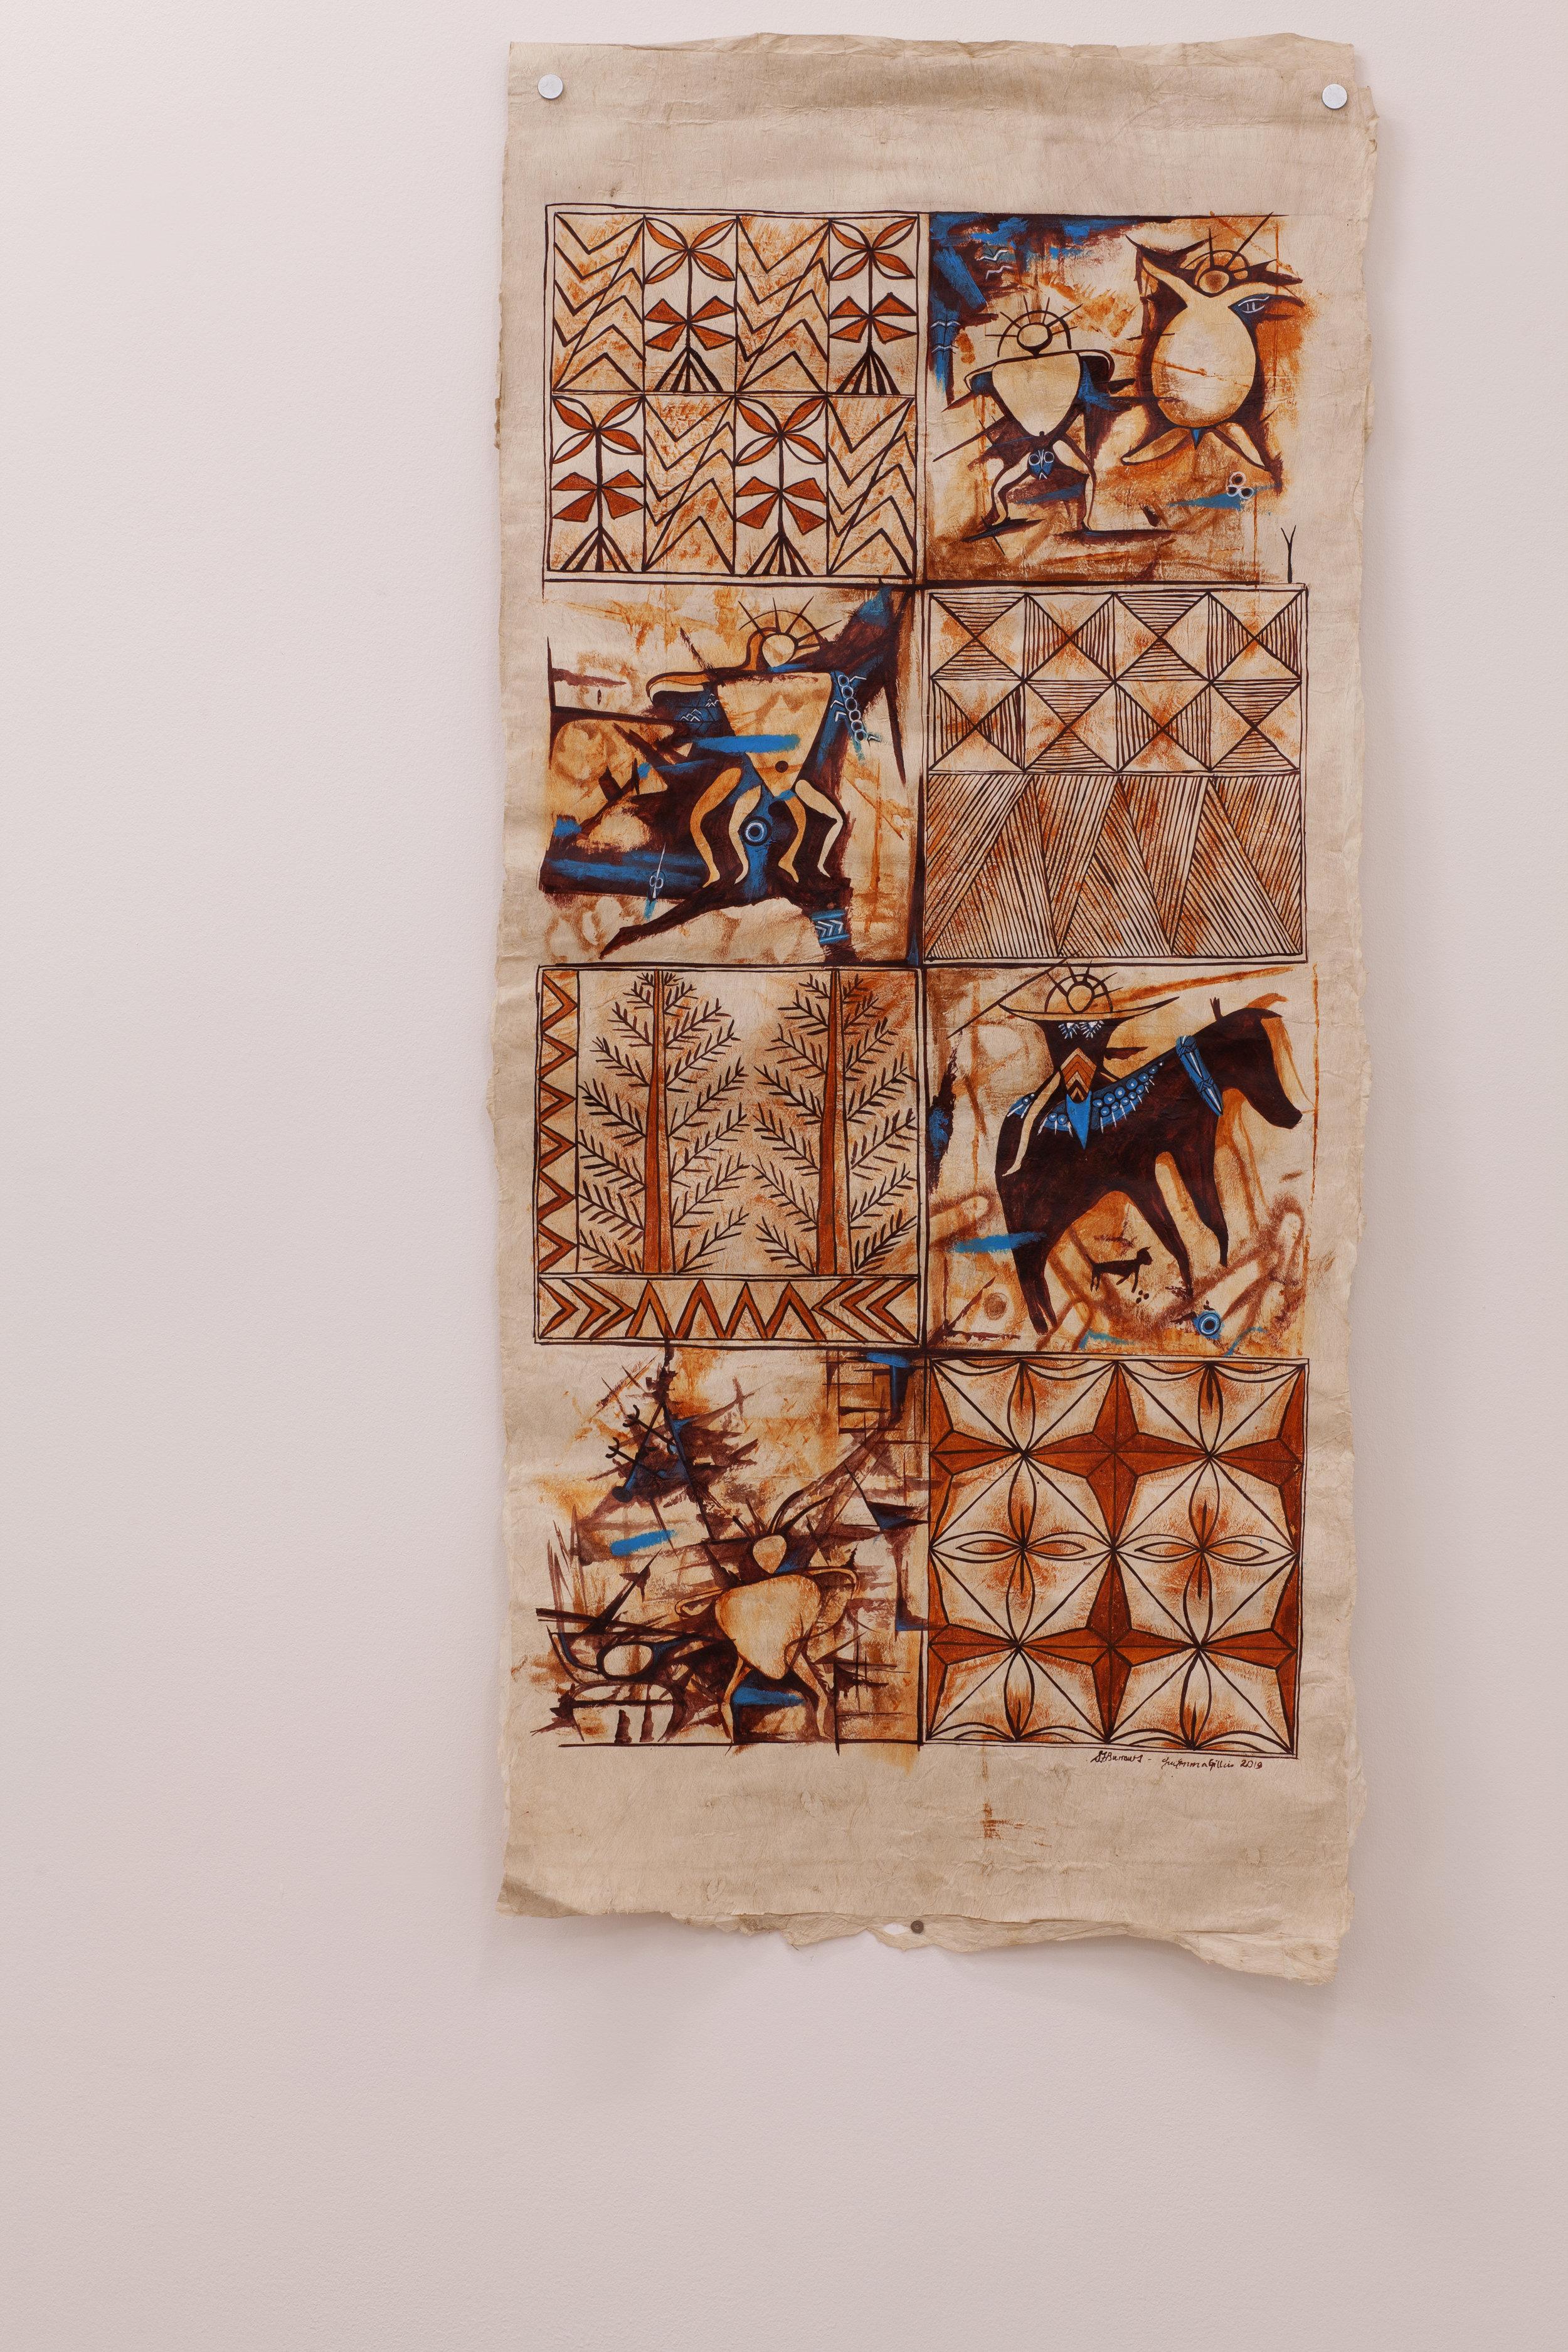 Tataki ʻe he Leá (Guided Language) , Ngatu (Tongan barkcloth), 600mm x 1070mm, 2019 Image: ©2018 Crystal Te Moananui Squares